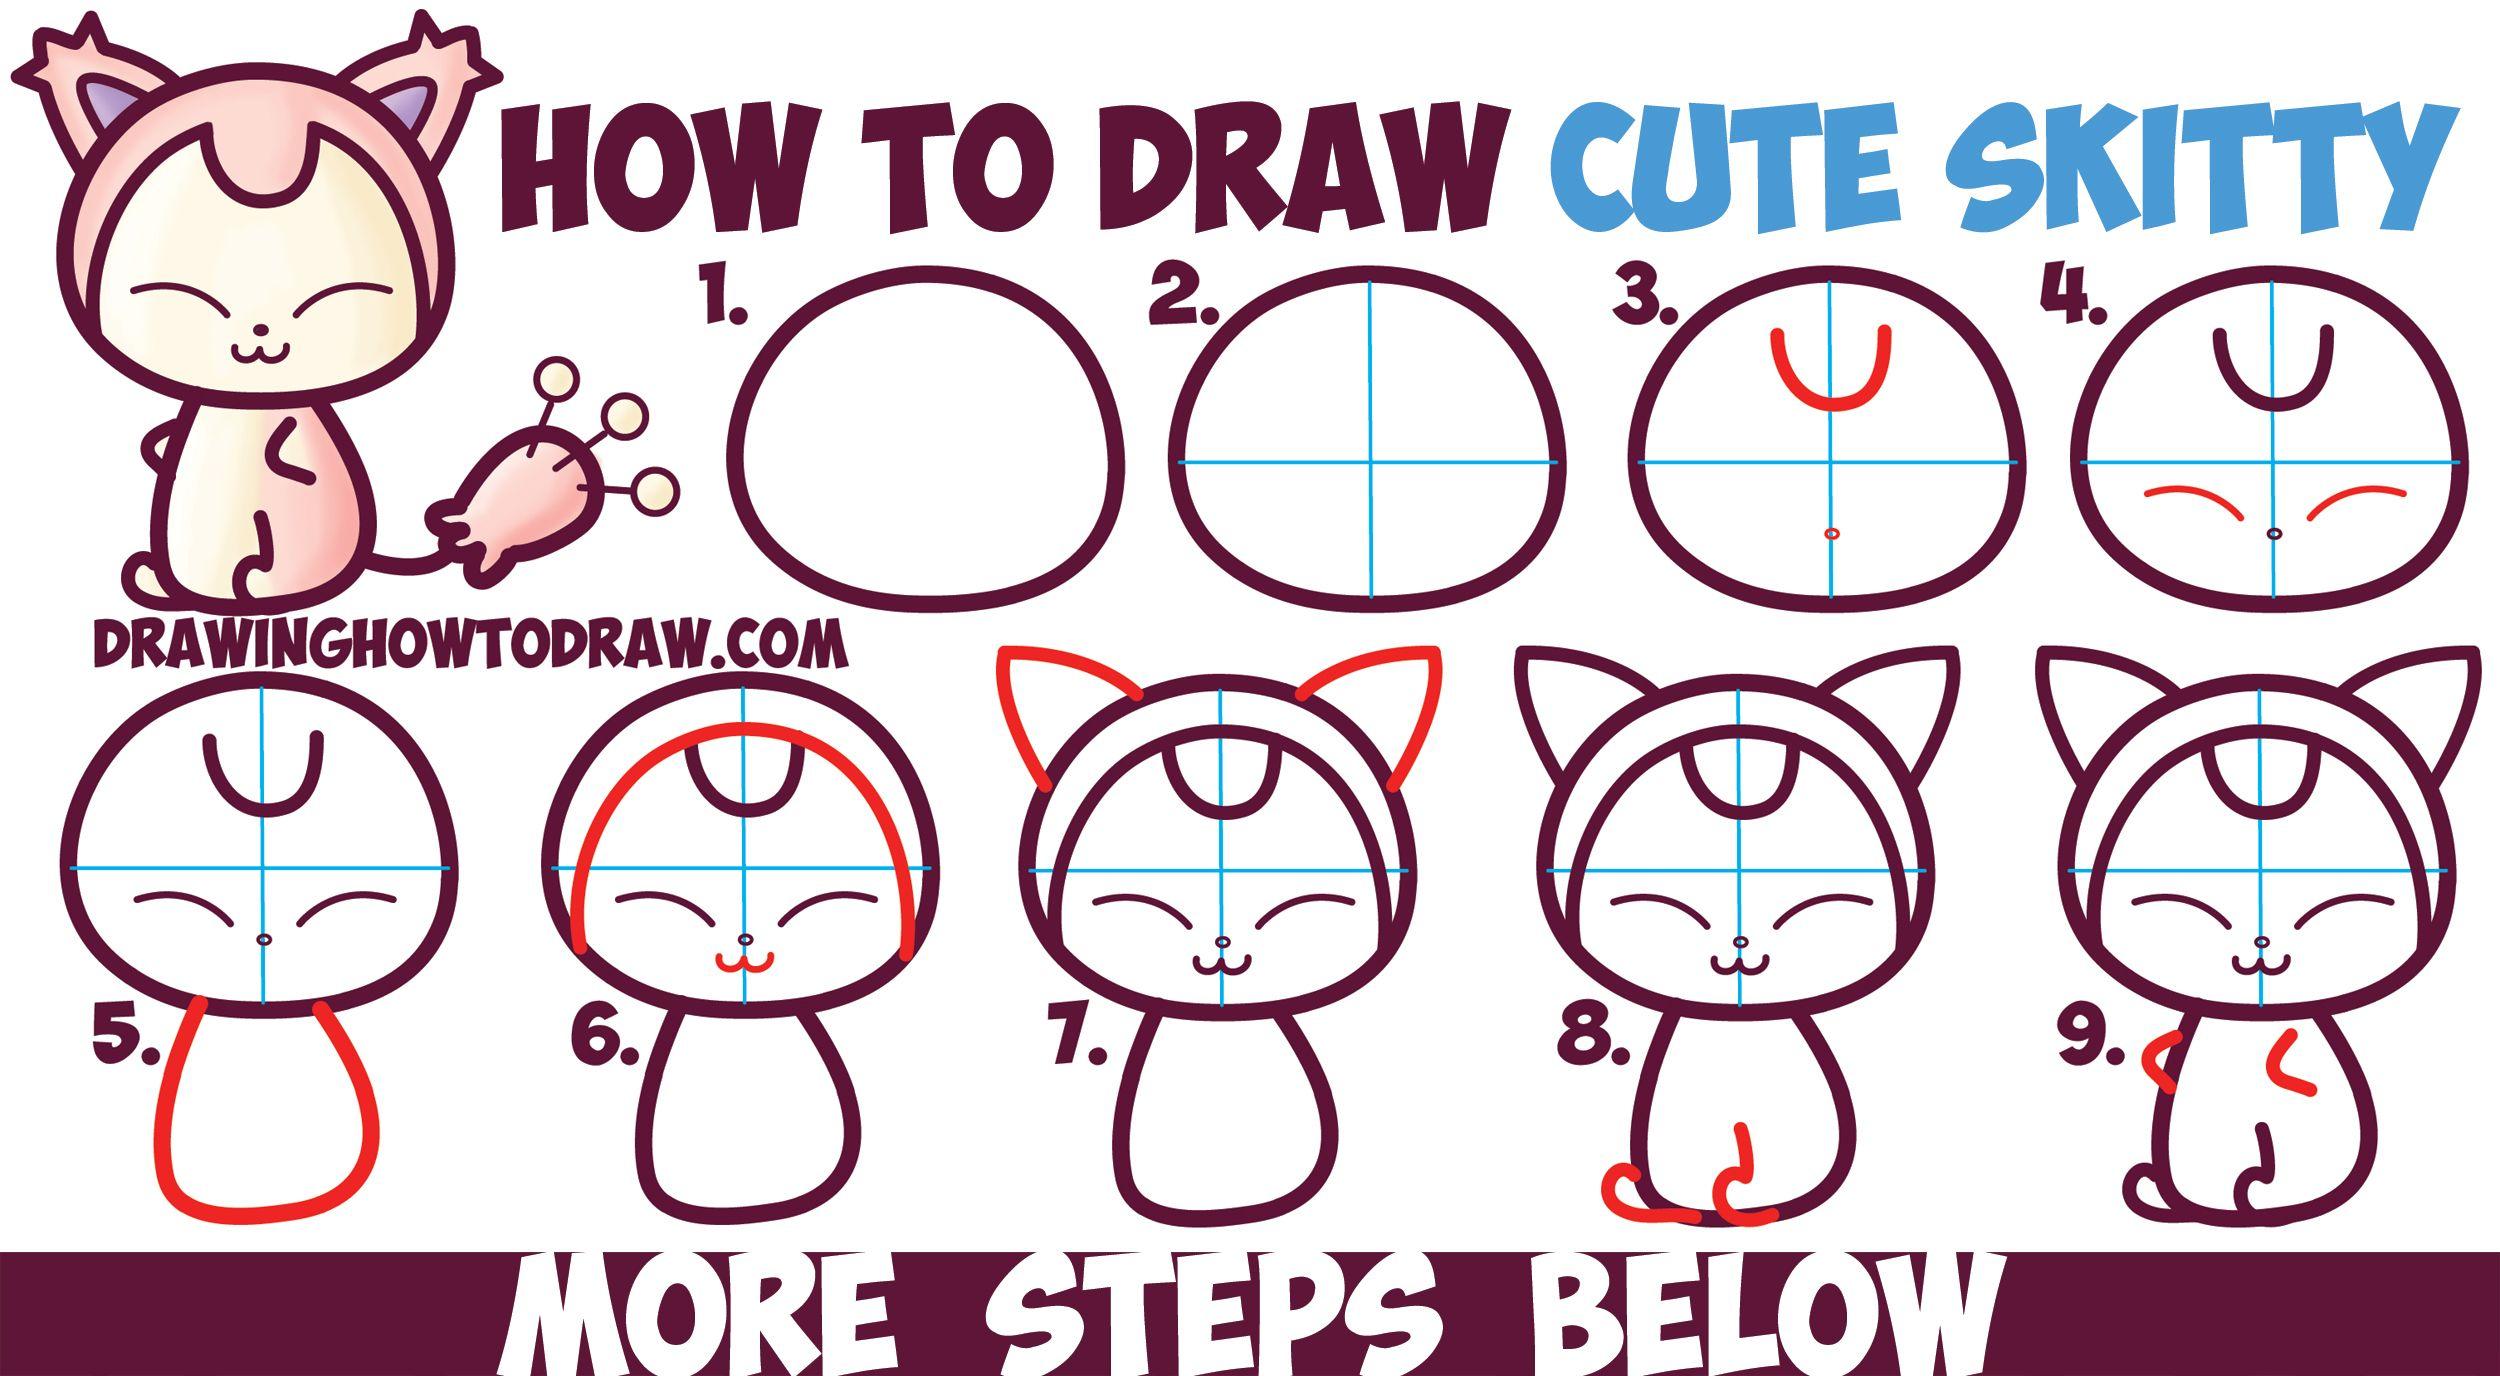 How To Draw Cute Kawaii Chibi Skitty From Pokemon In